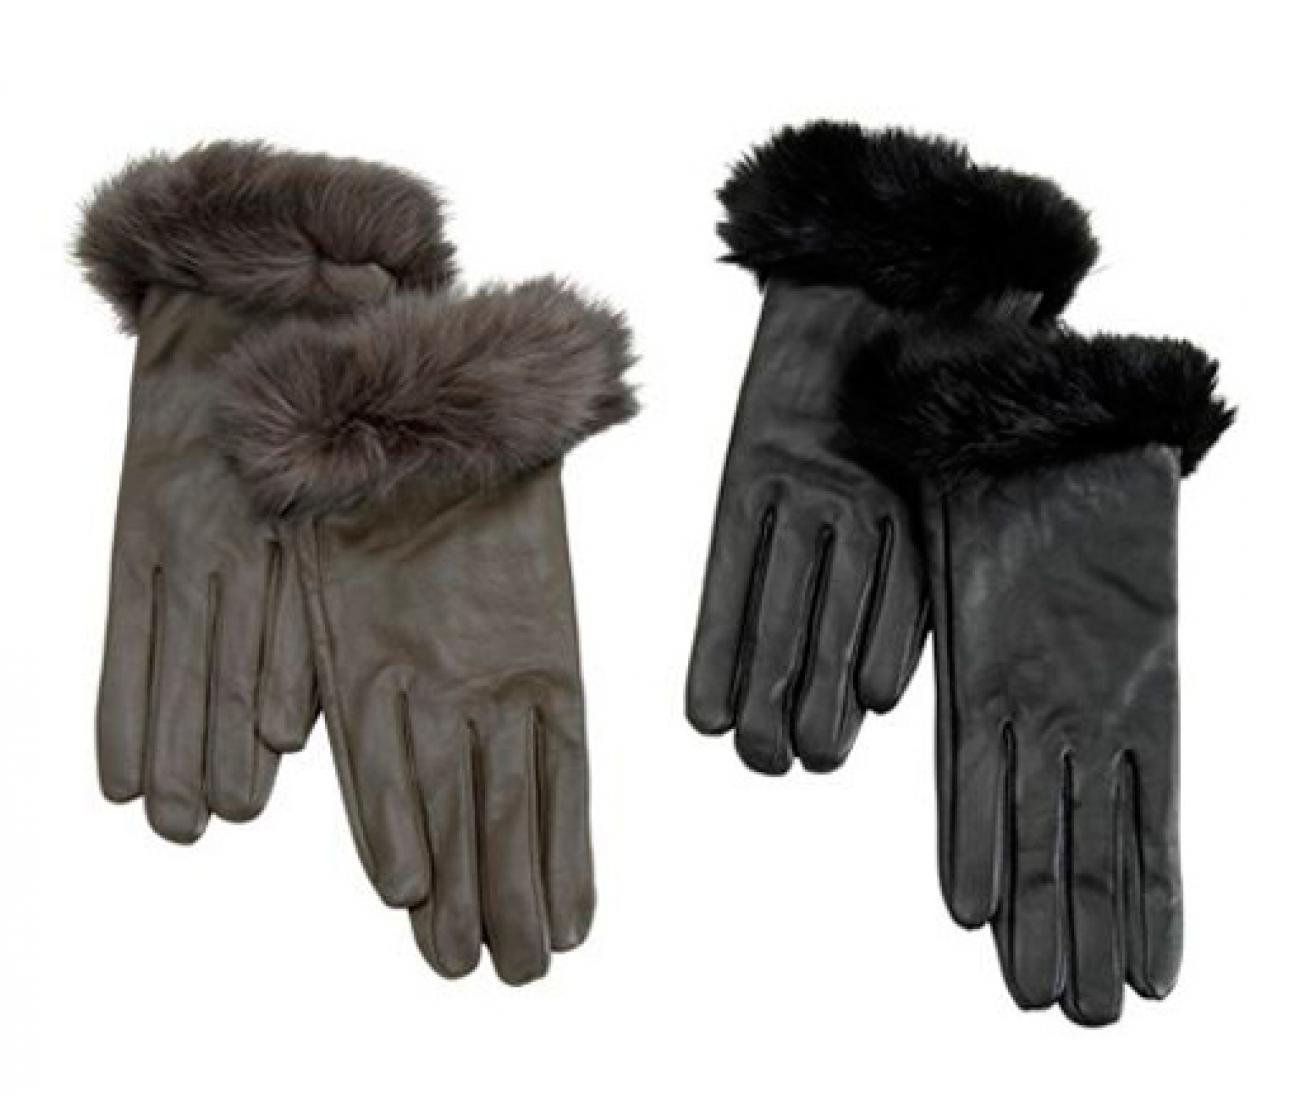 Home Κεντρική Το φετίχ του 2014 τα γάντια 6f172112dfc